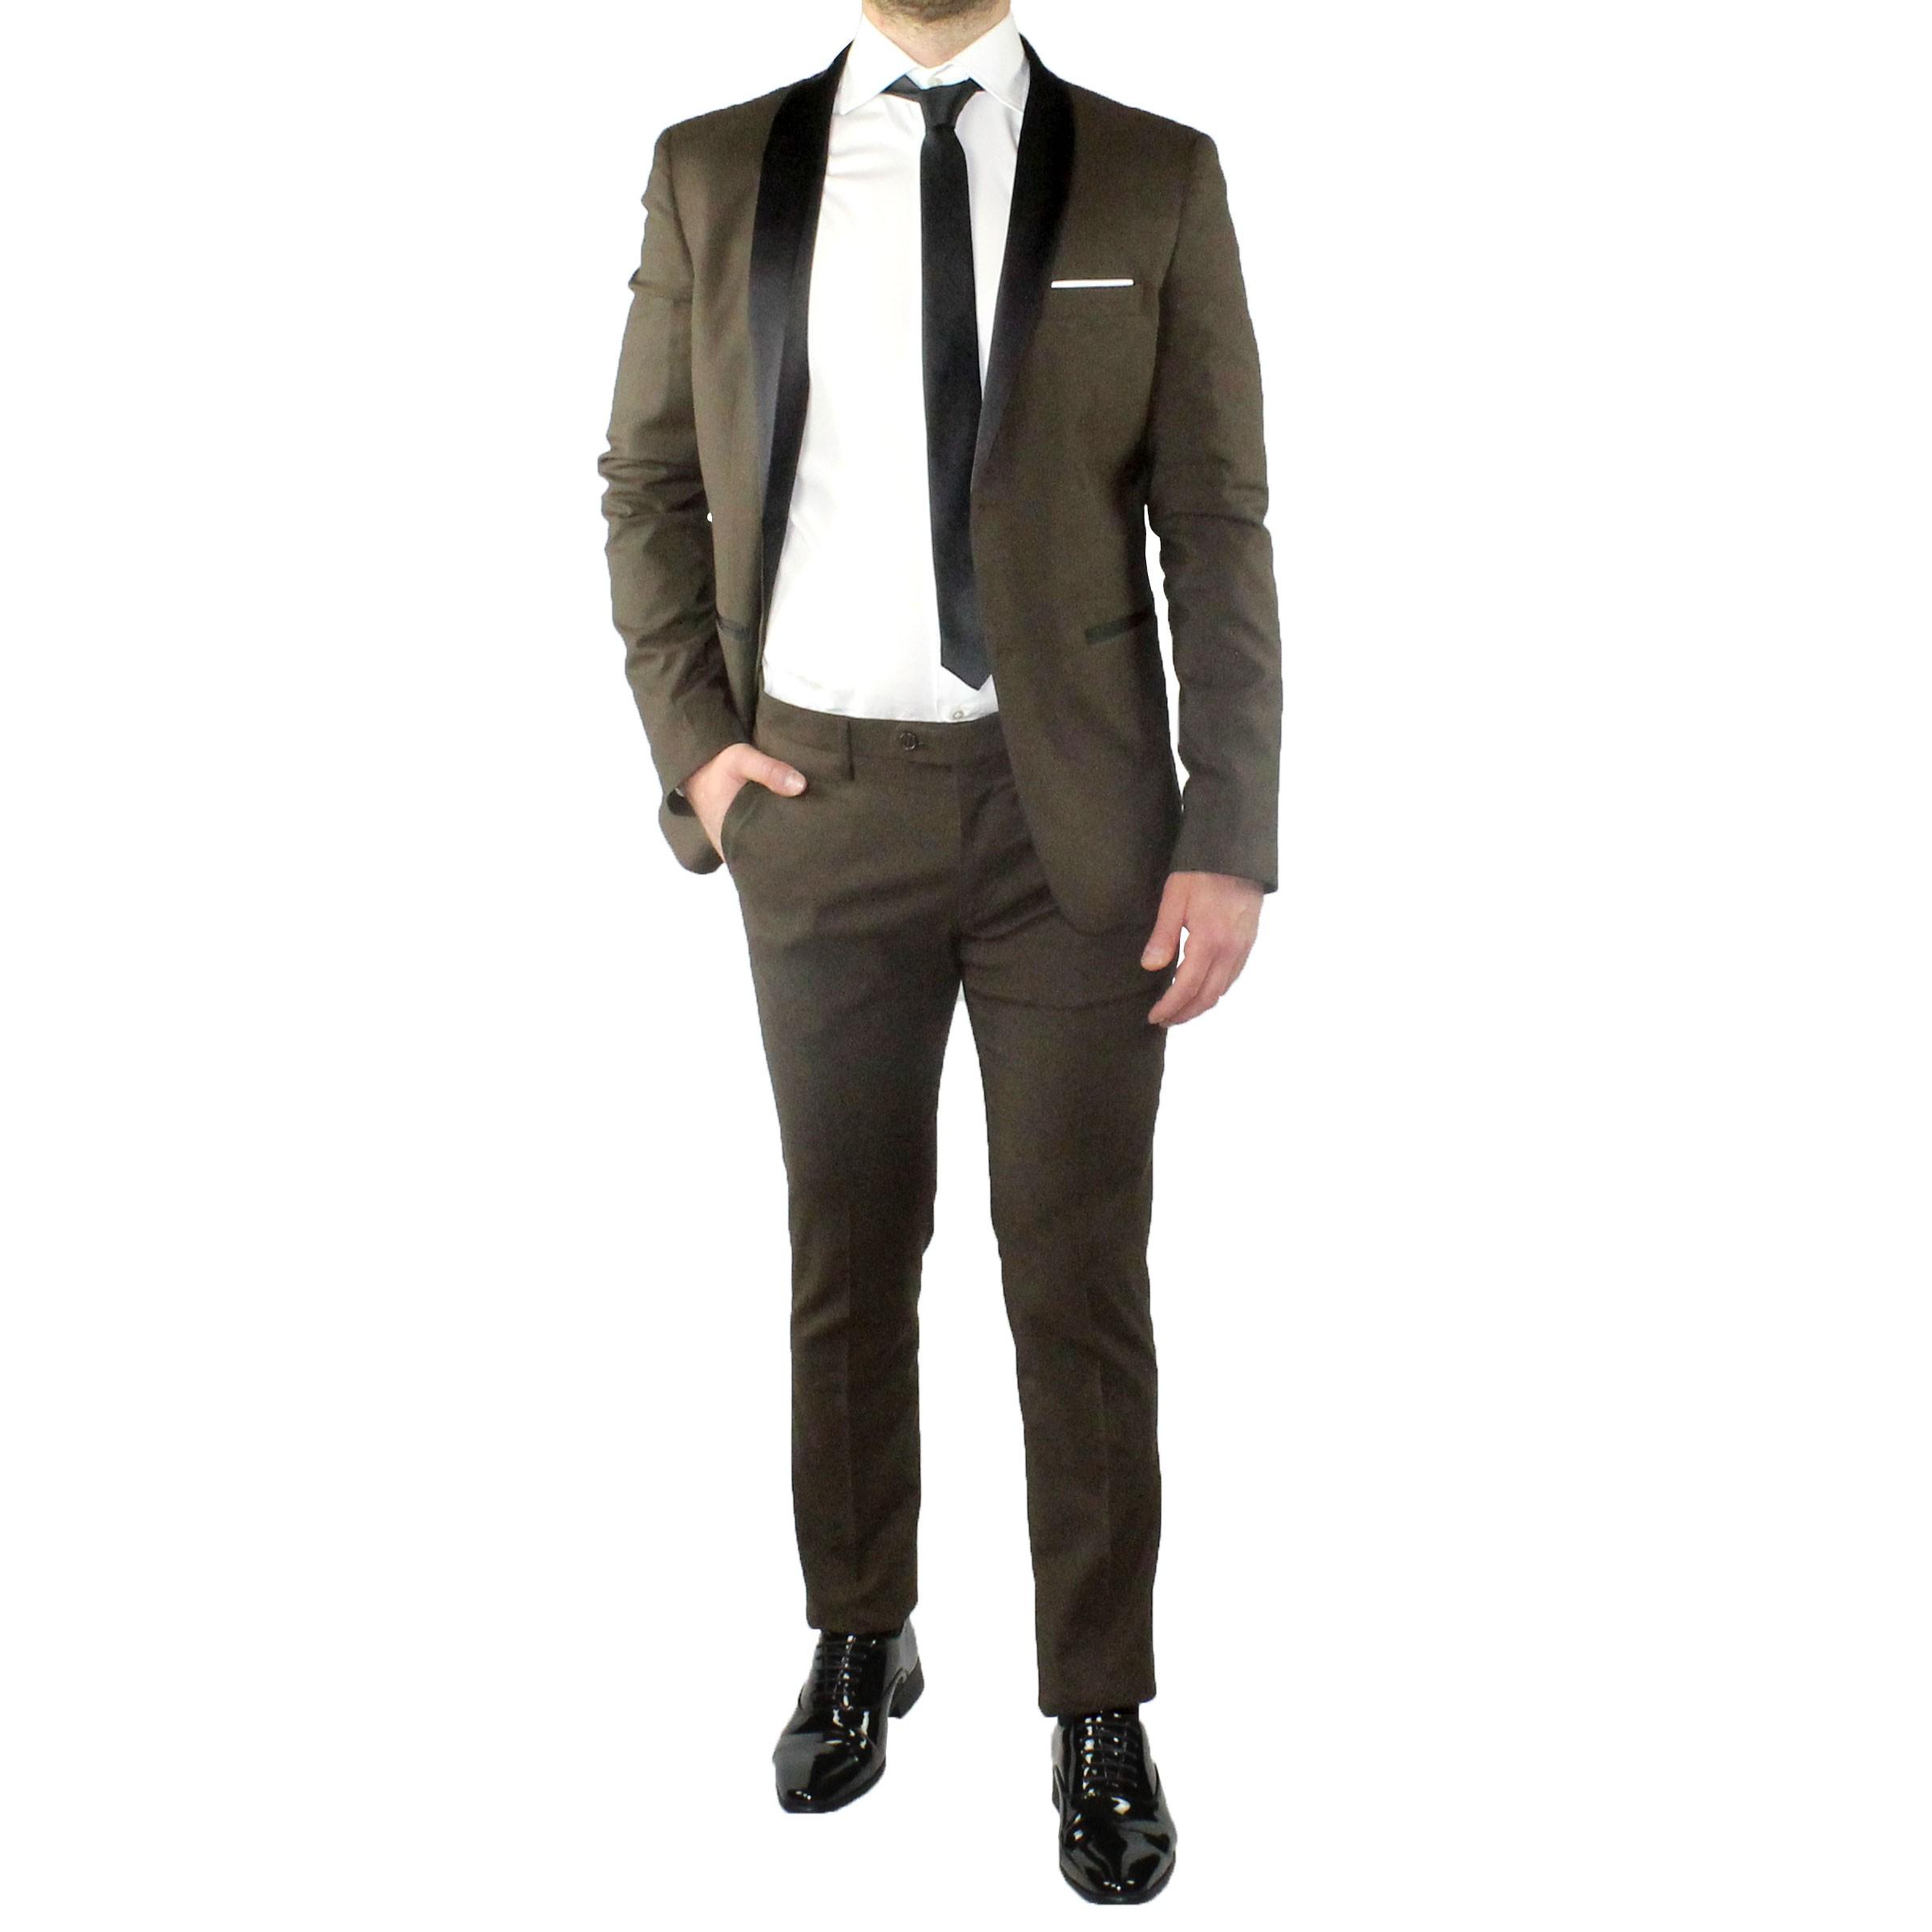 Abito-Uomo-Smoking-Elegante-Vestito-Completo-Estivo-Cerimonia-Sartoriale-Slim miniatura 15